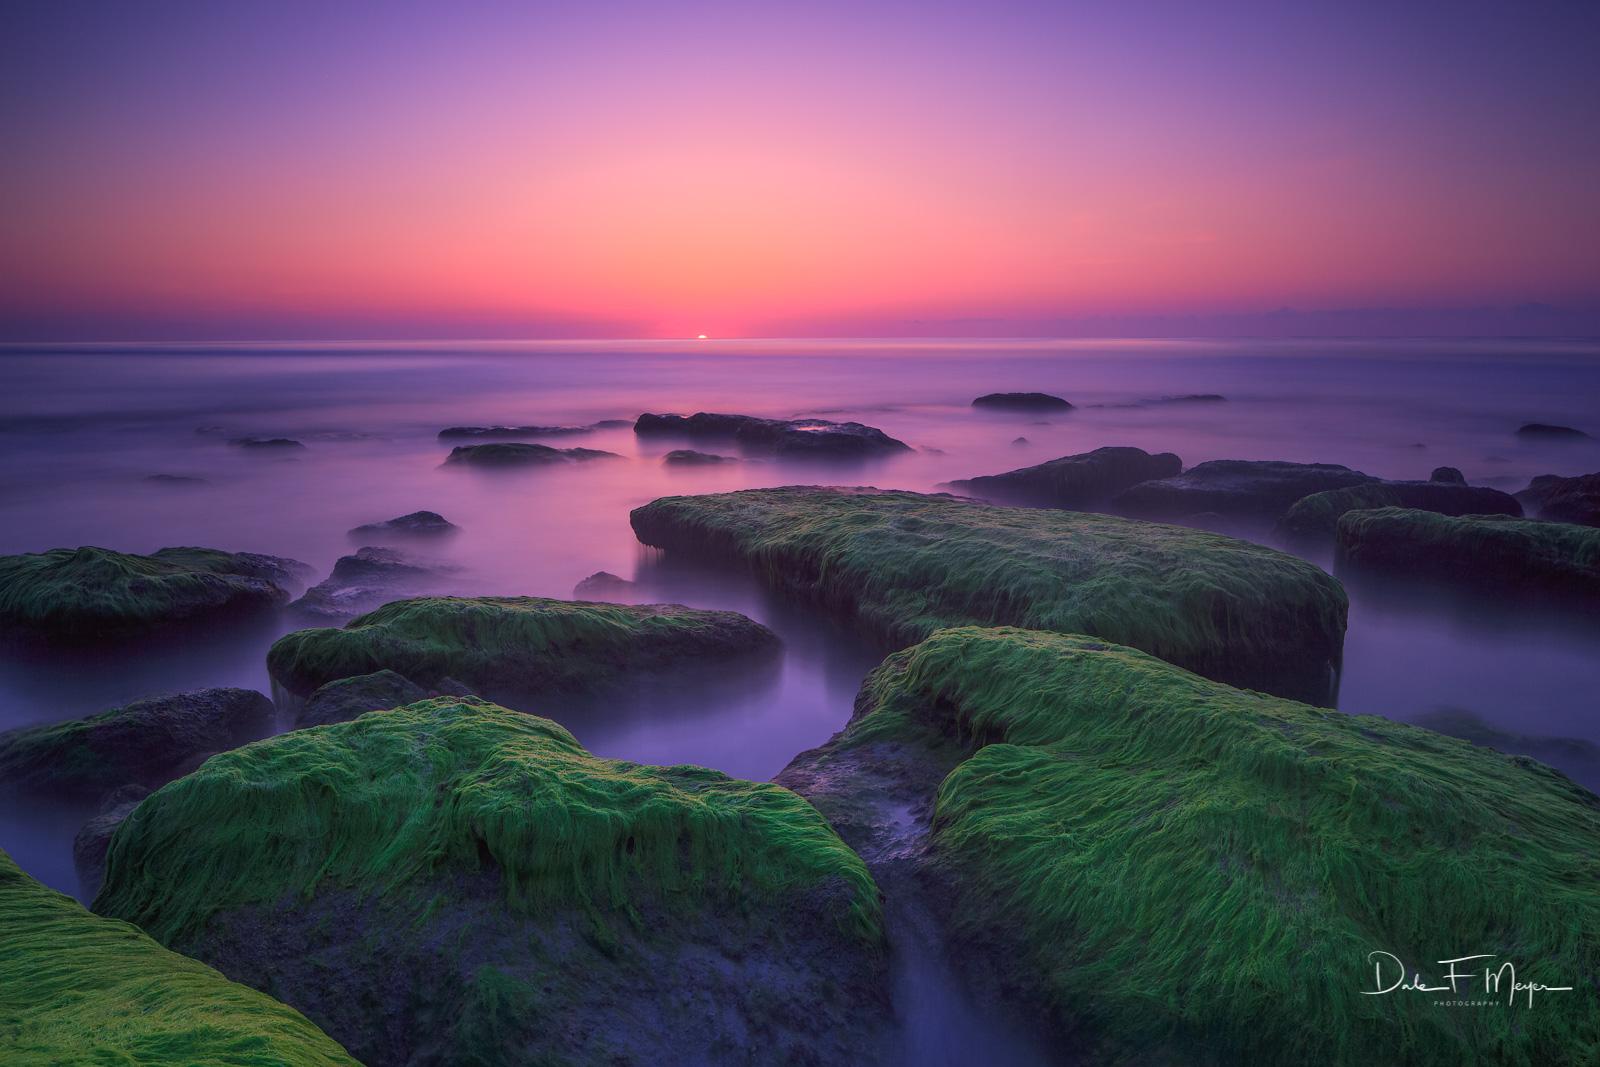 Coquina Rocks,Morning Light, Carolina Beach, North Carolina